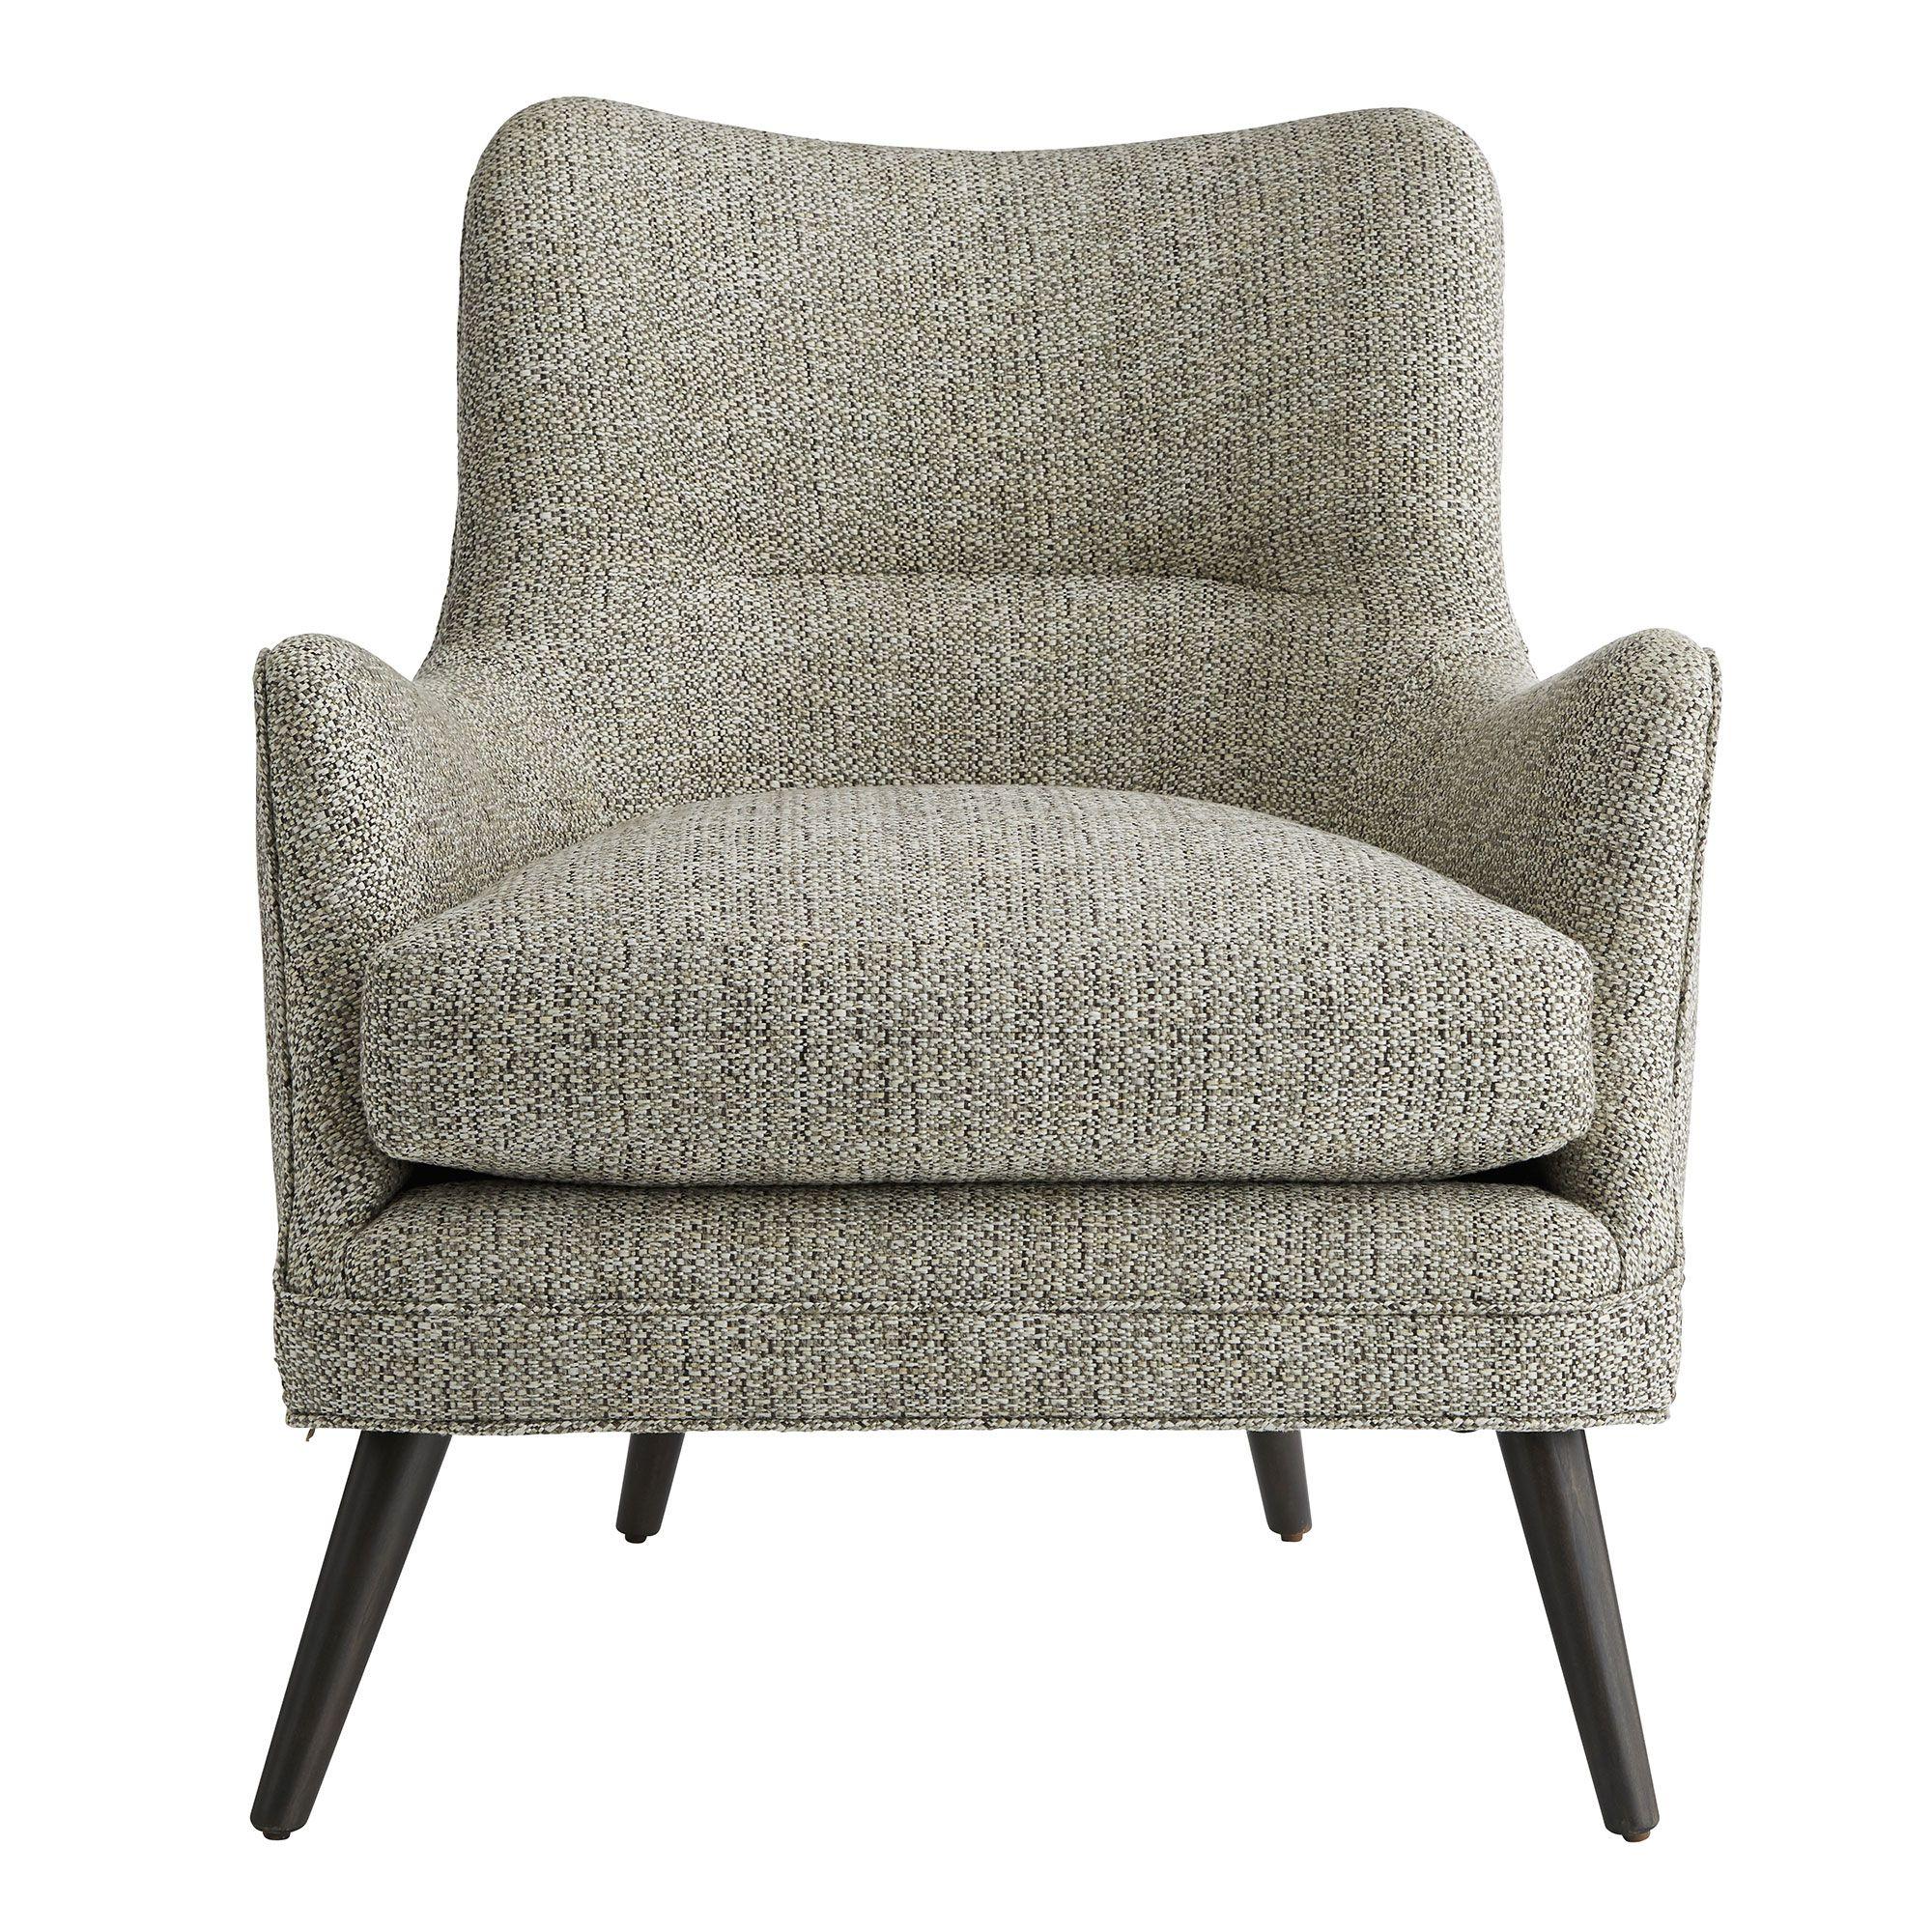 Seger Chair Driftwood Tweed Grey Ash